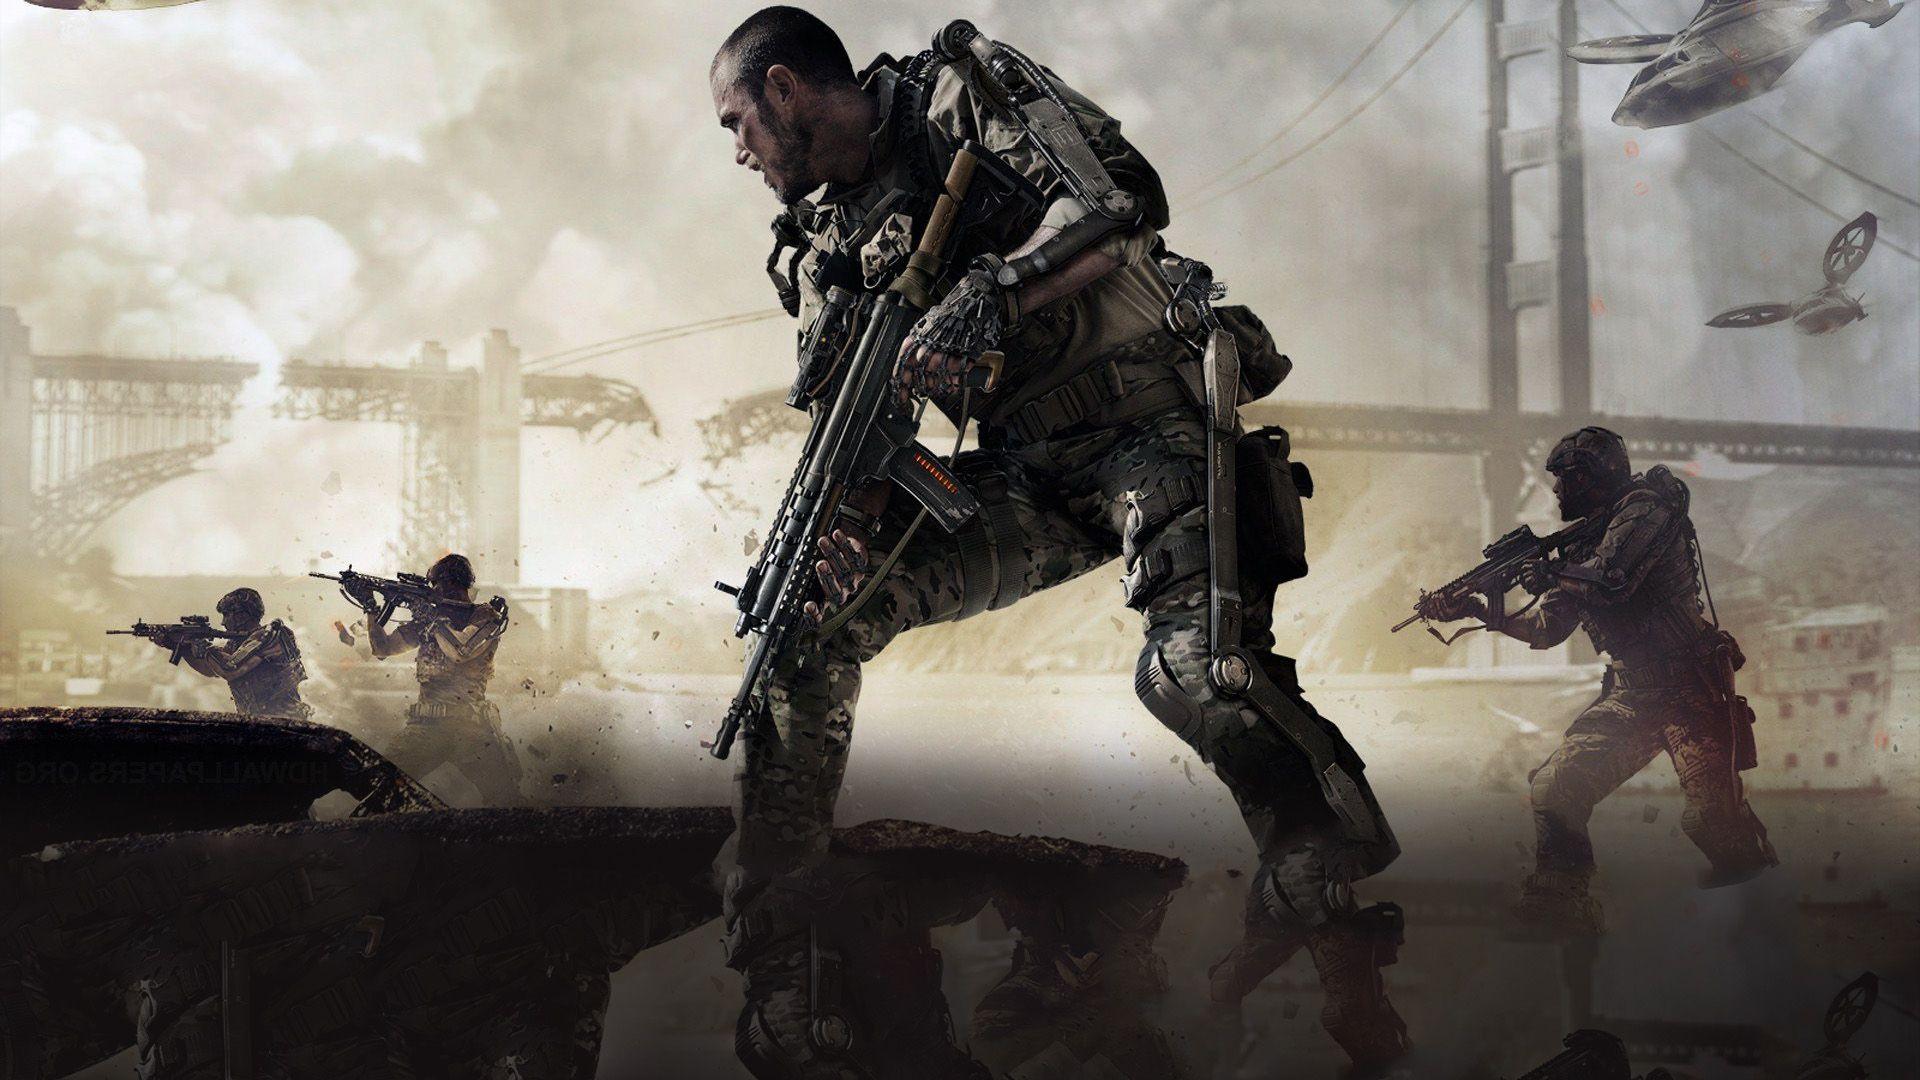 call-of-duty-advanced-warfare-supremacy-pc-steam-cd-key-satin-al-durmaplay.jpg